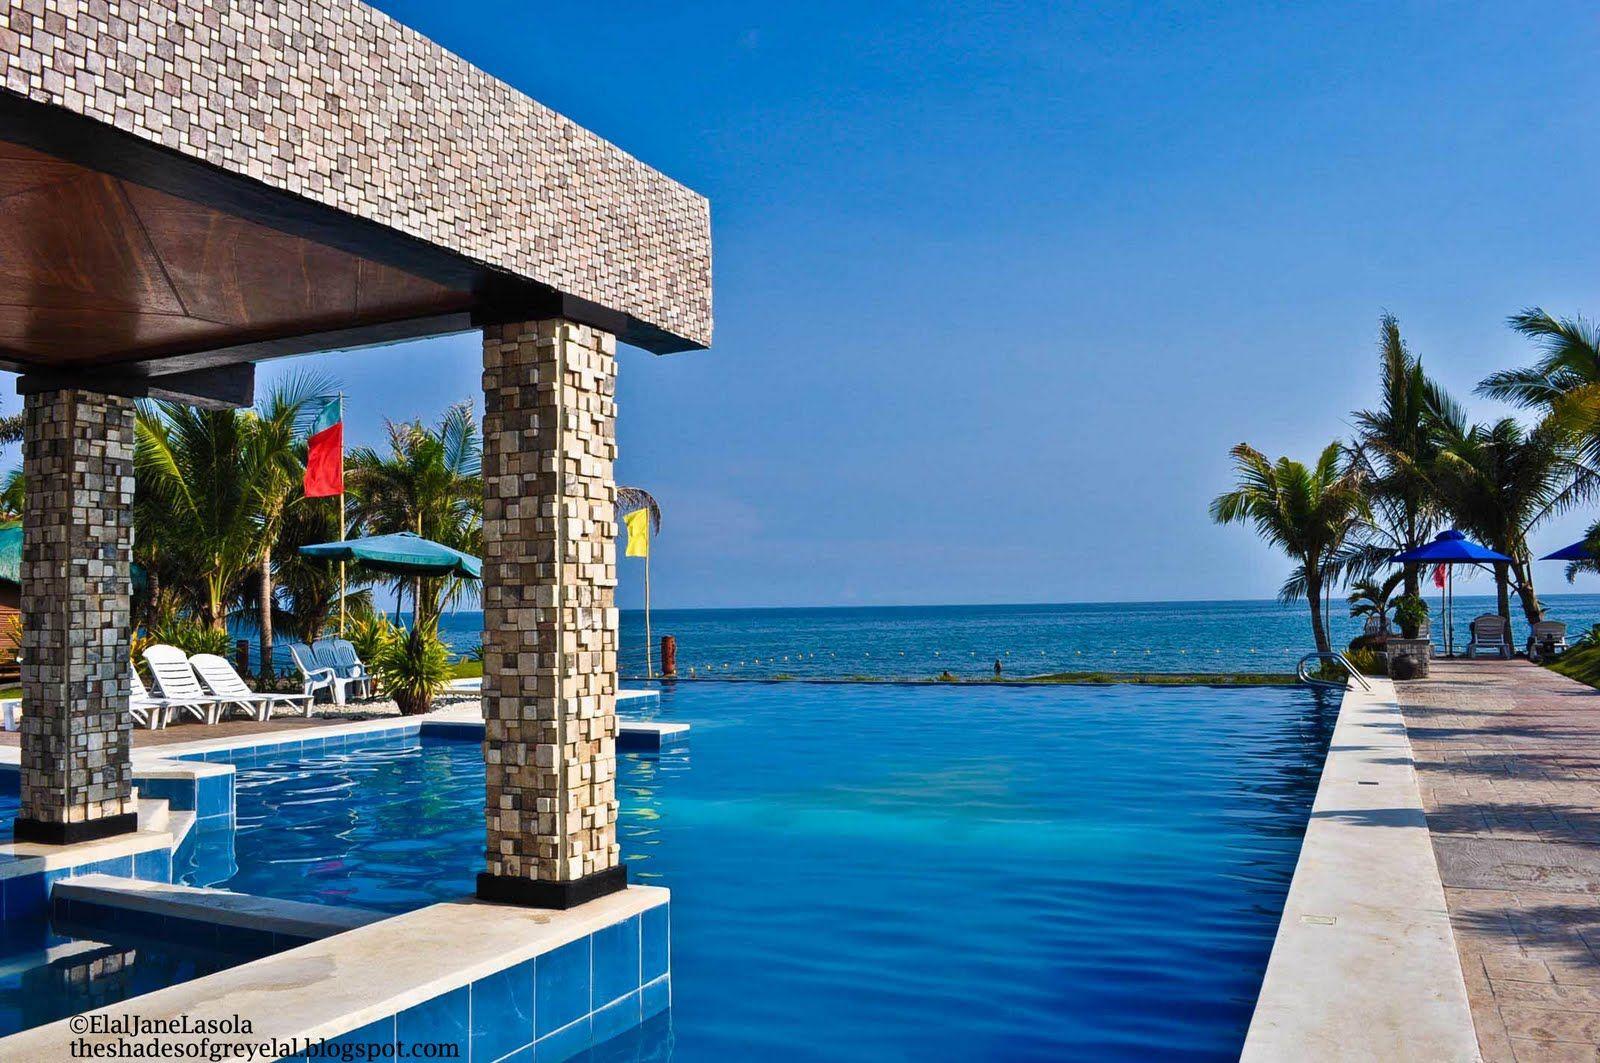 beach resort in bataan Google Search